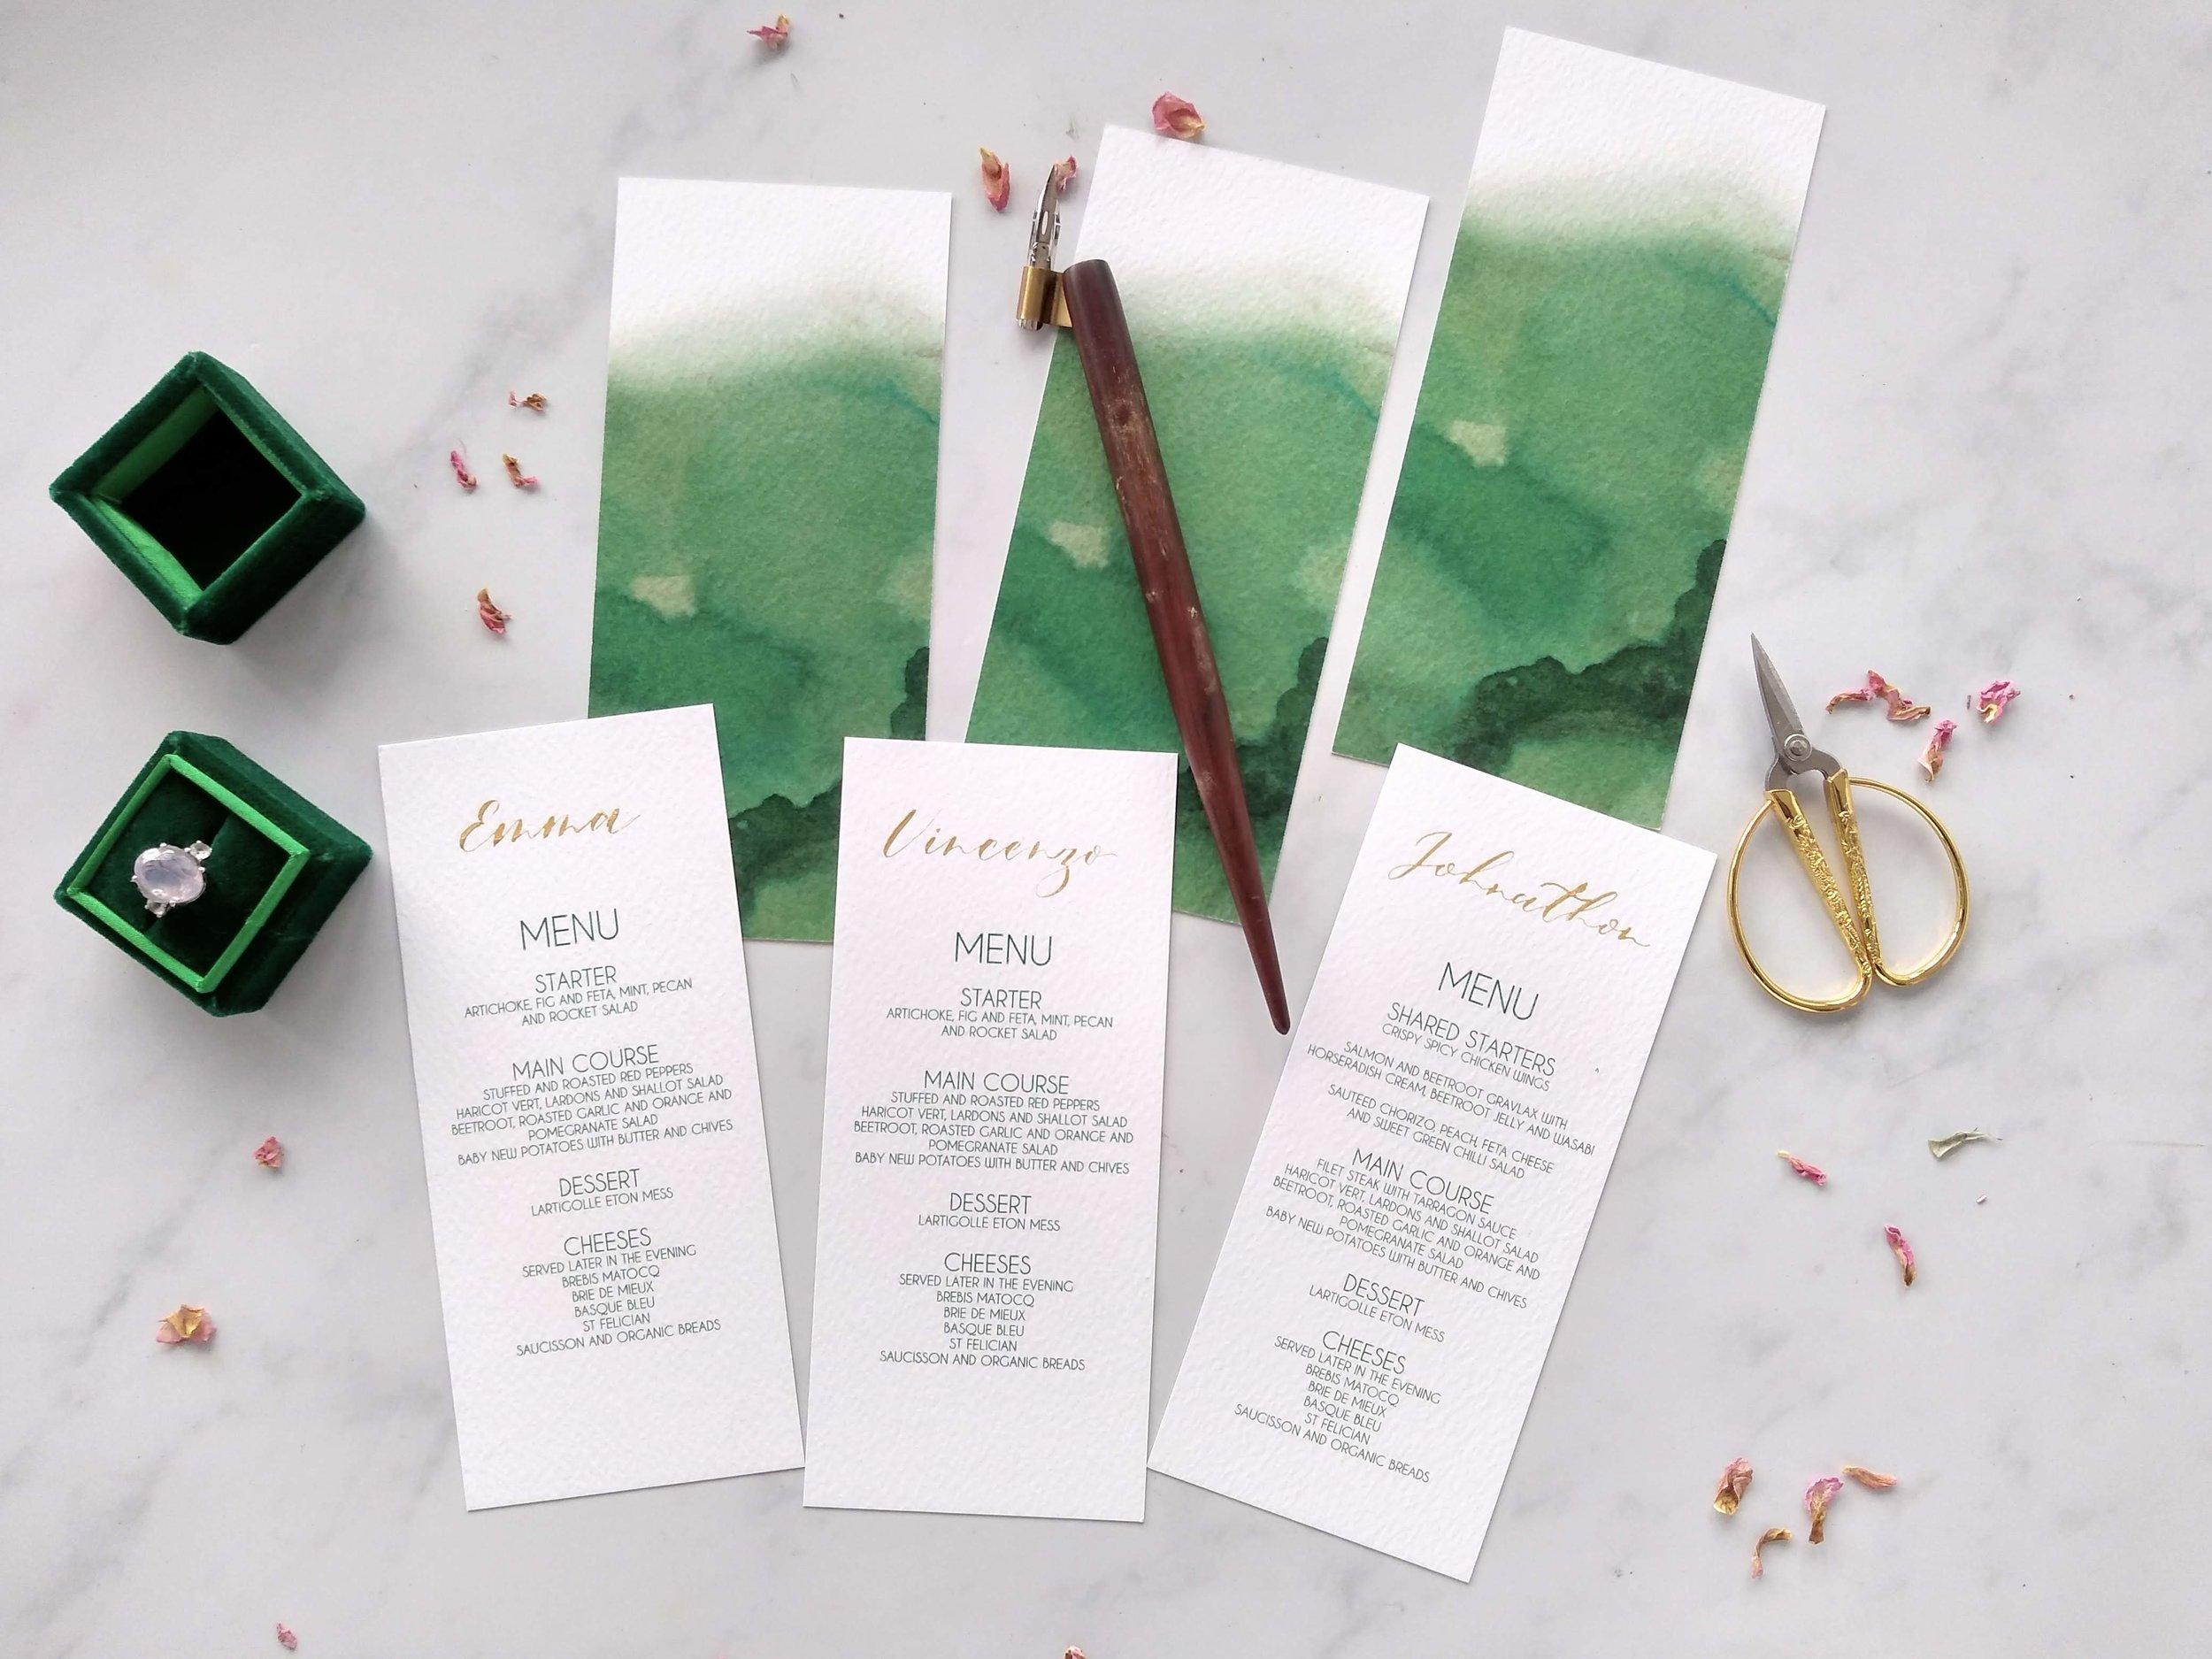 Menus personalised with handwritten calligraphy